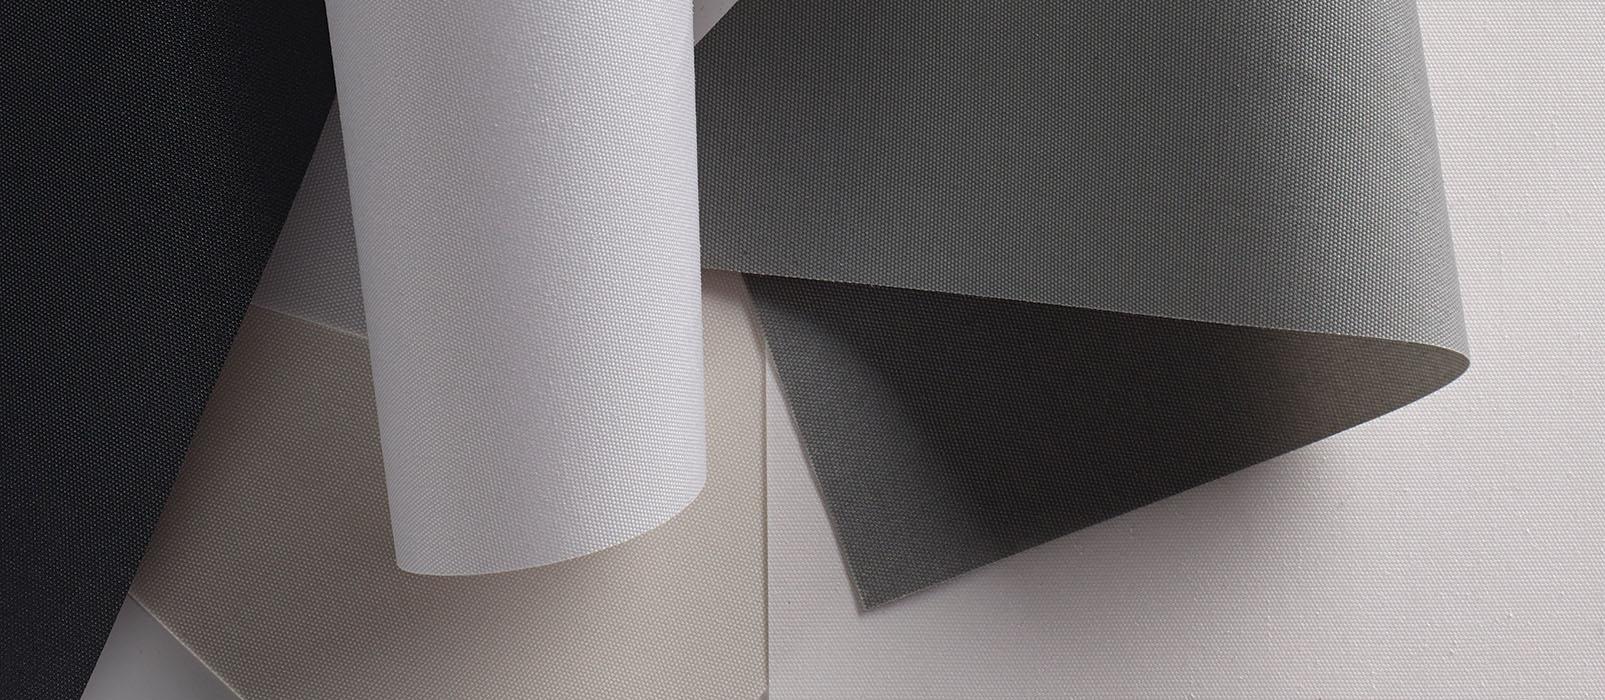 Component - Products - Fabrics - Elements Translucent Banner